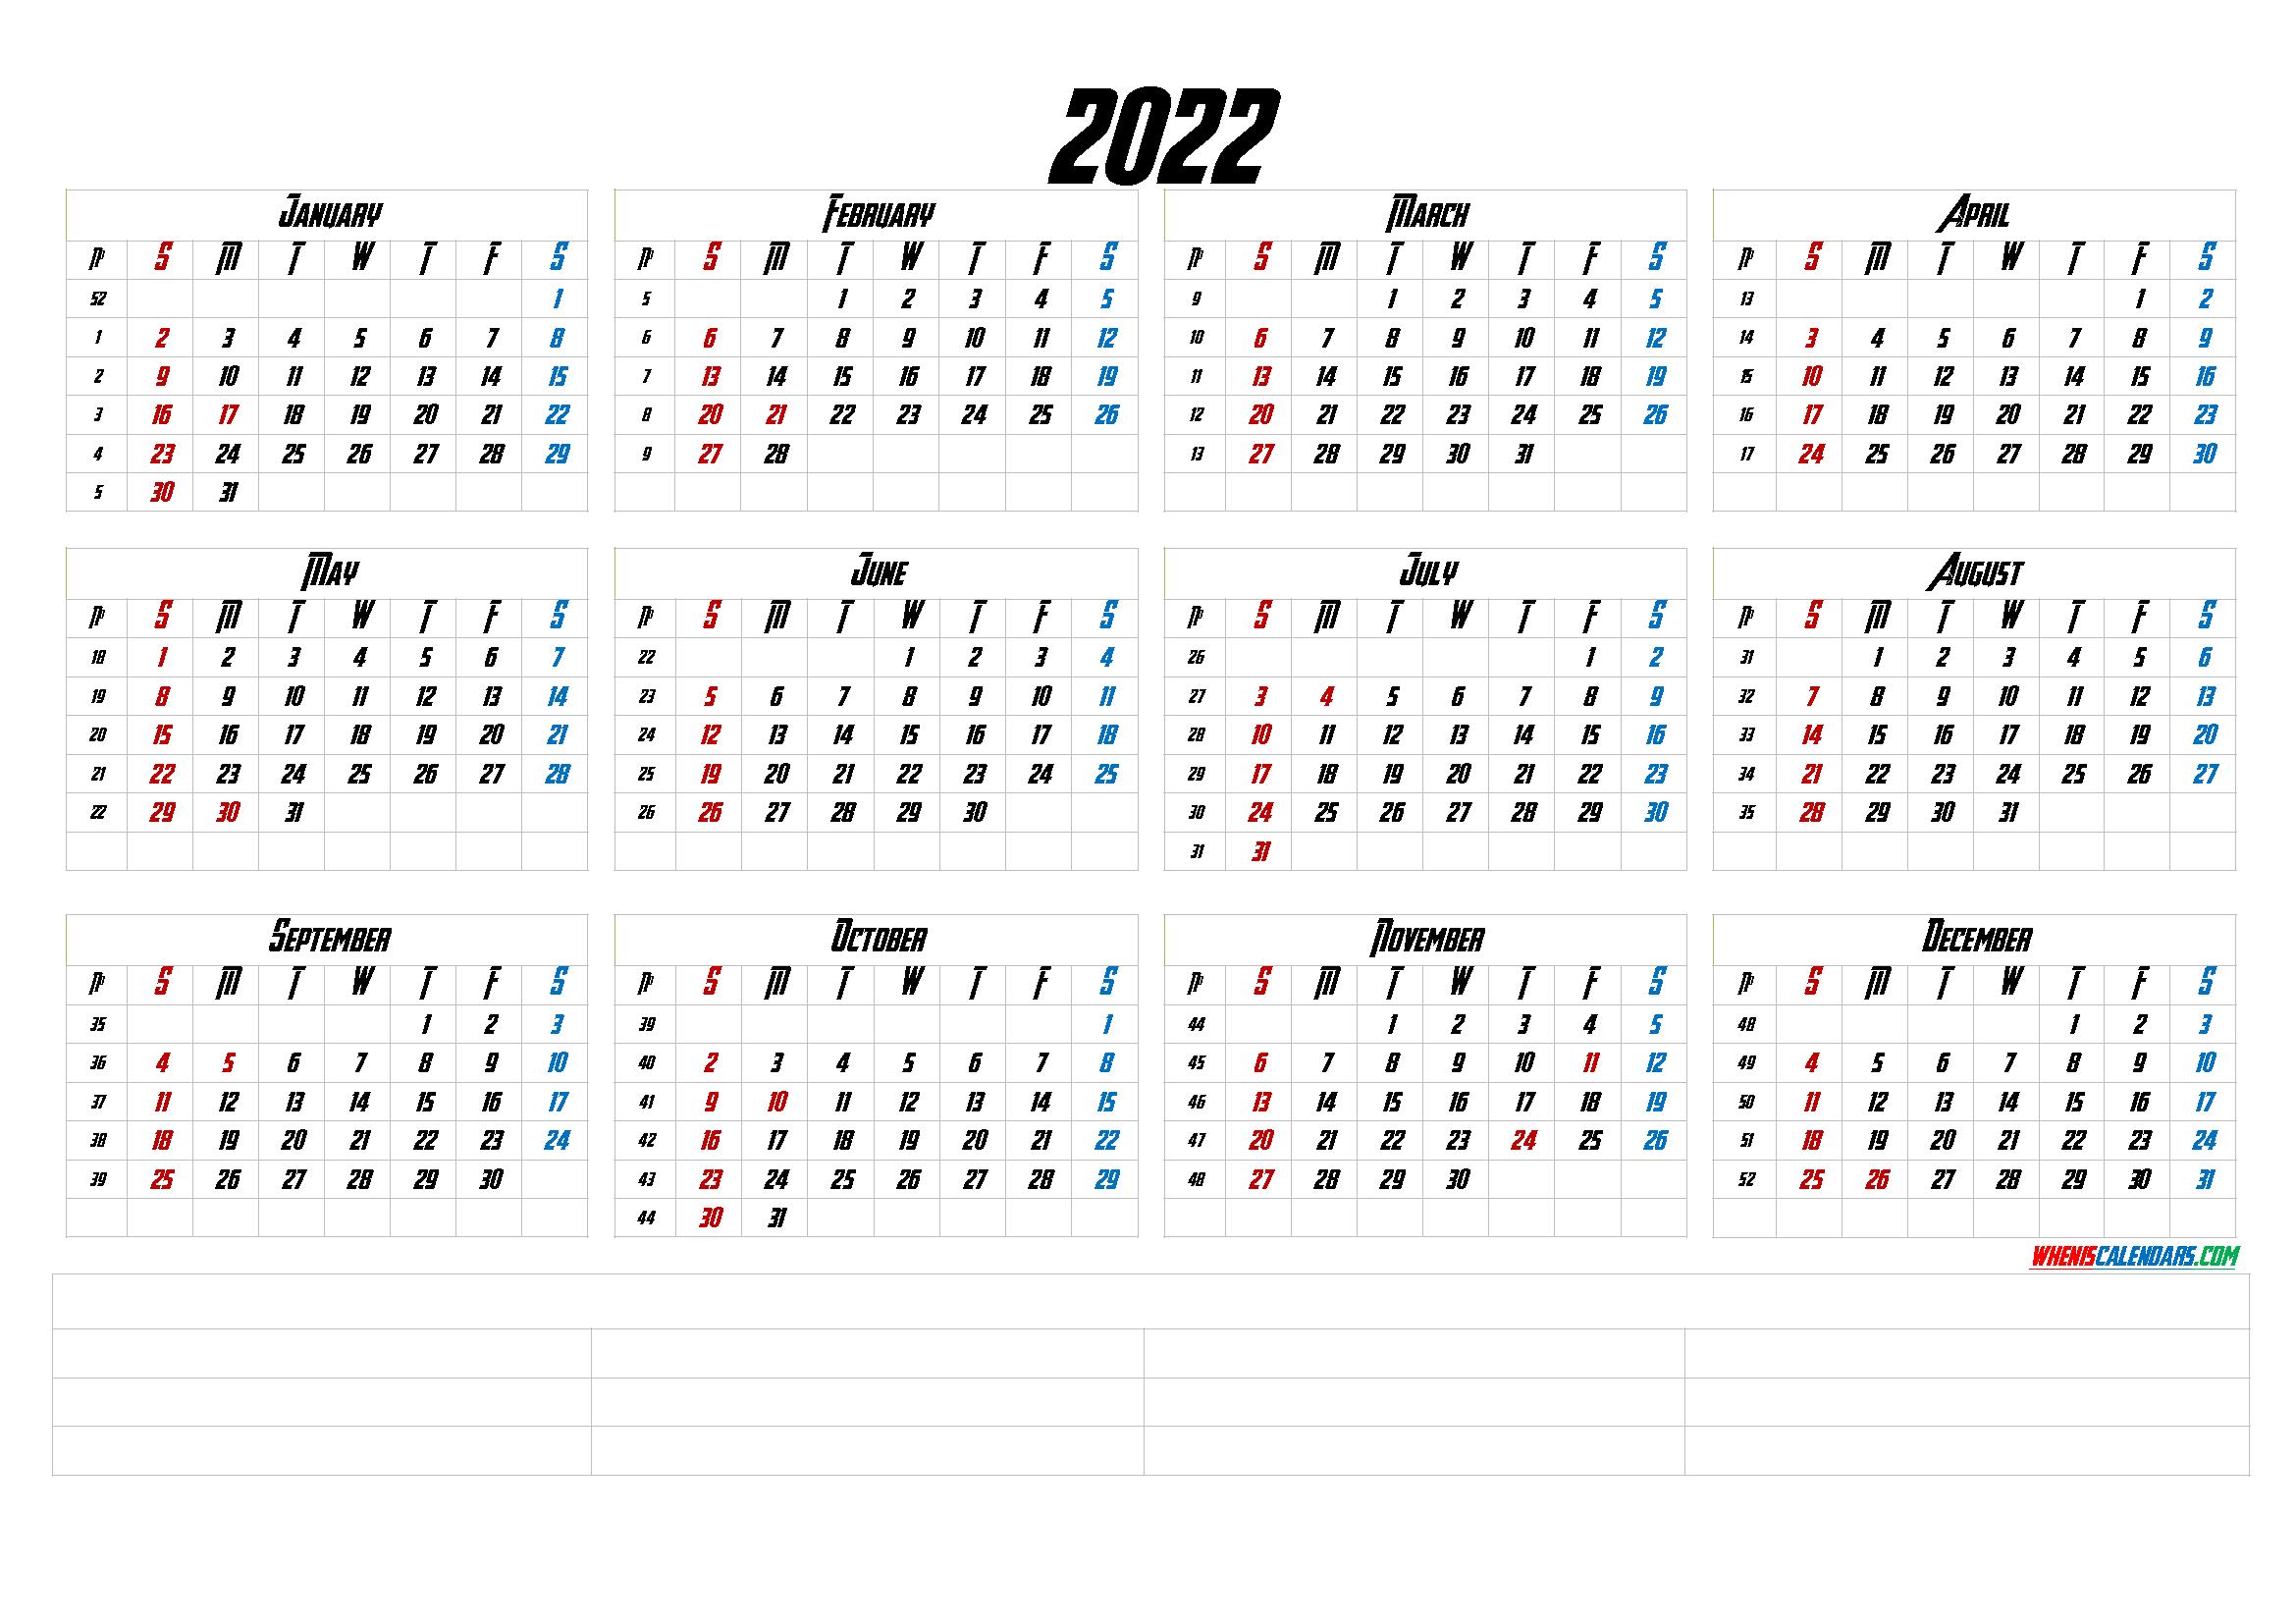 2022 Month Calendar.12 Month Calendar Printable 2022 6 Templates 12 Month Calendar Printable Calendar With Week Numbers Monthly Calendar Printable